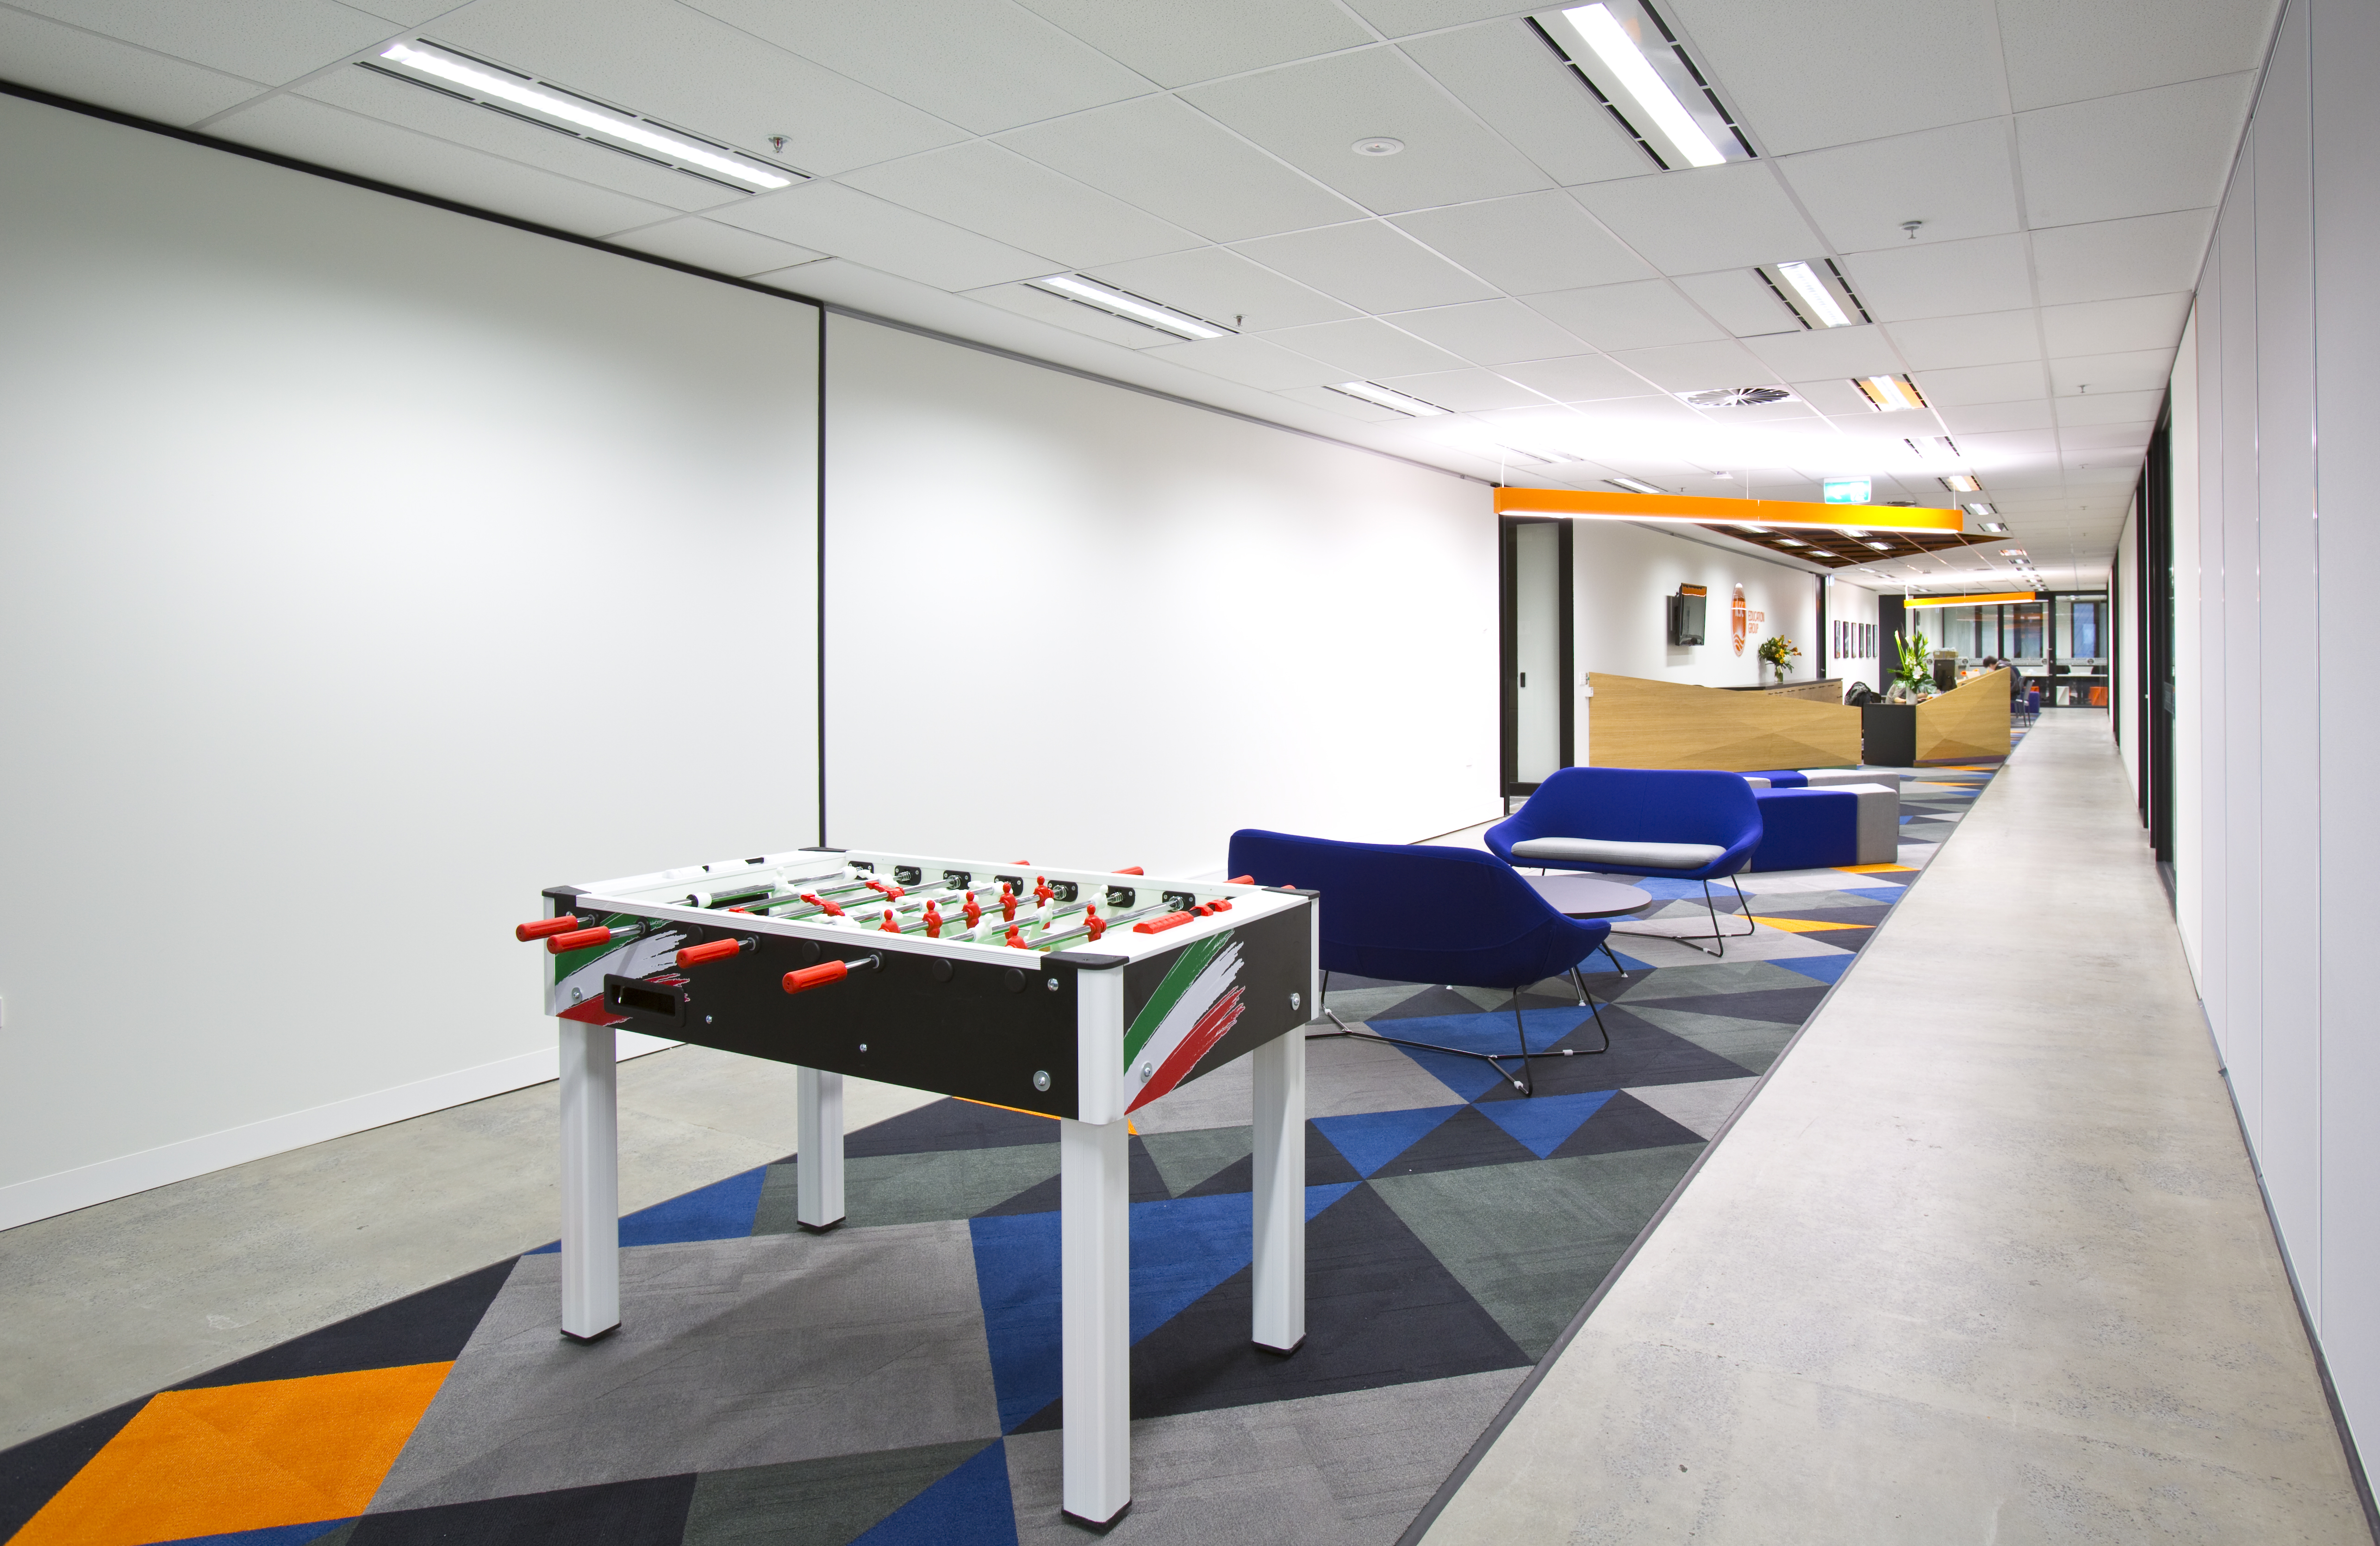 ilsc-melbourne-campus-foosball-table